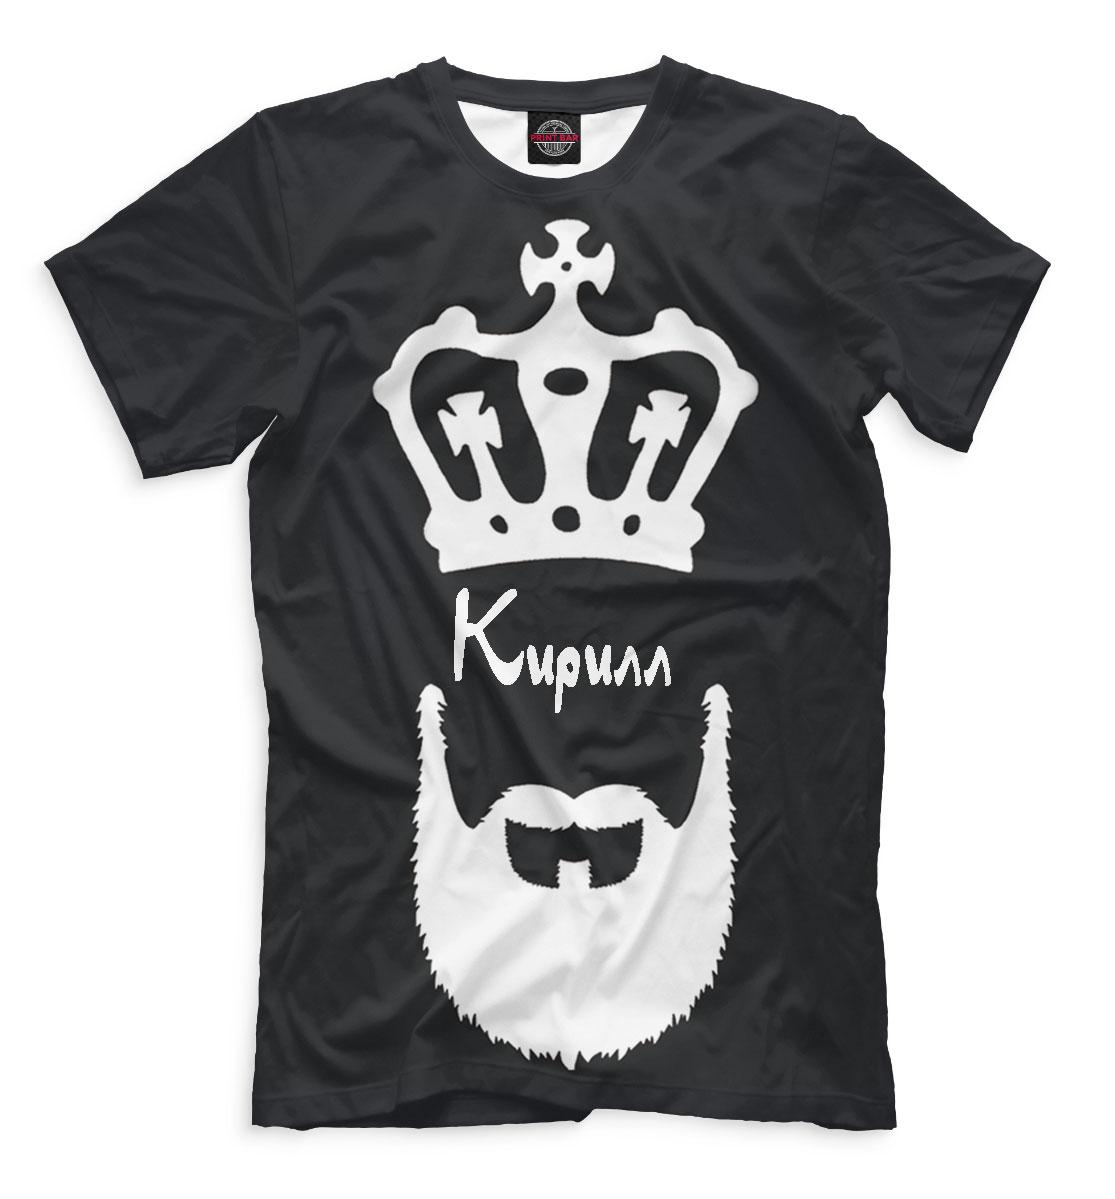 Купить Кирилл — борода и корона, Printbar, Футболки, KIR-677068-fut-2